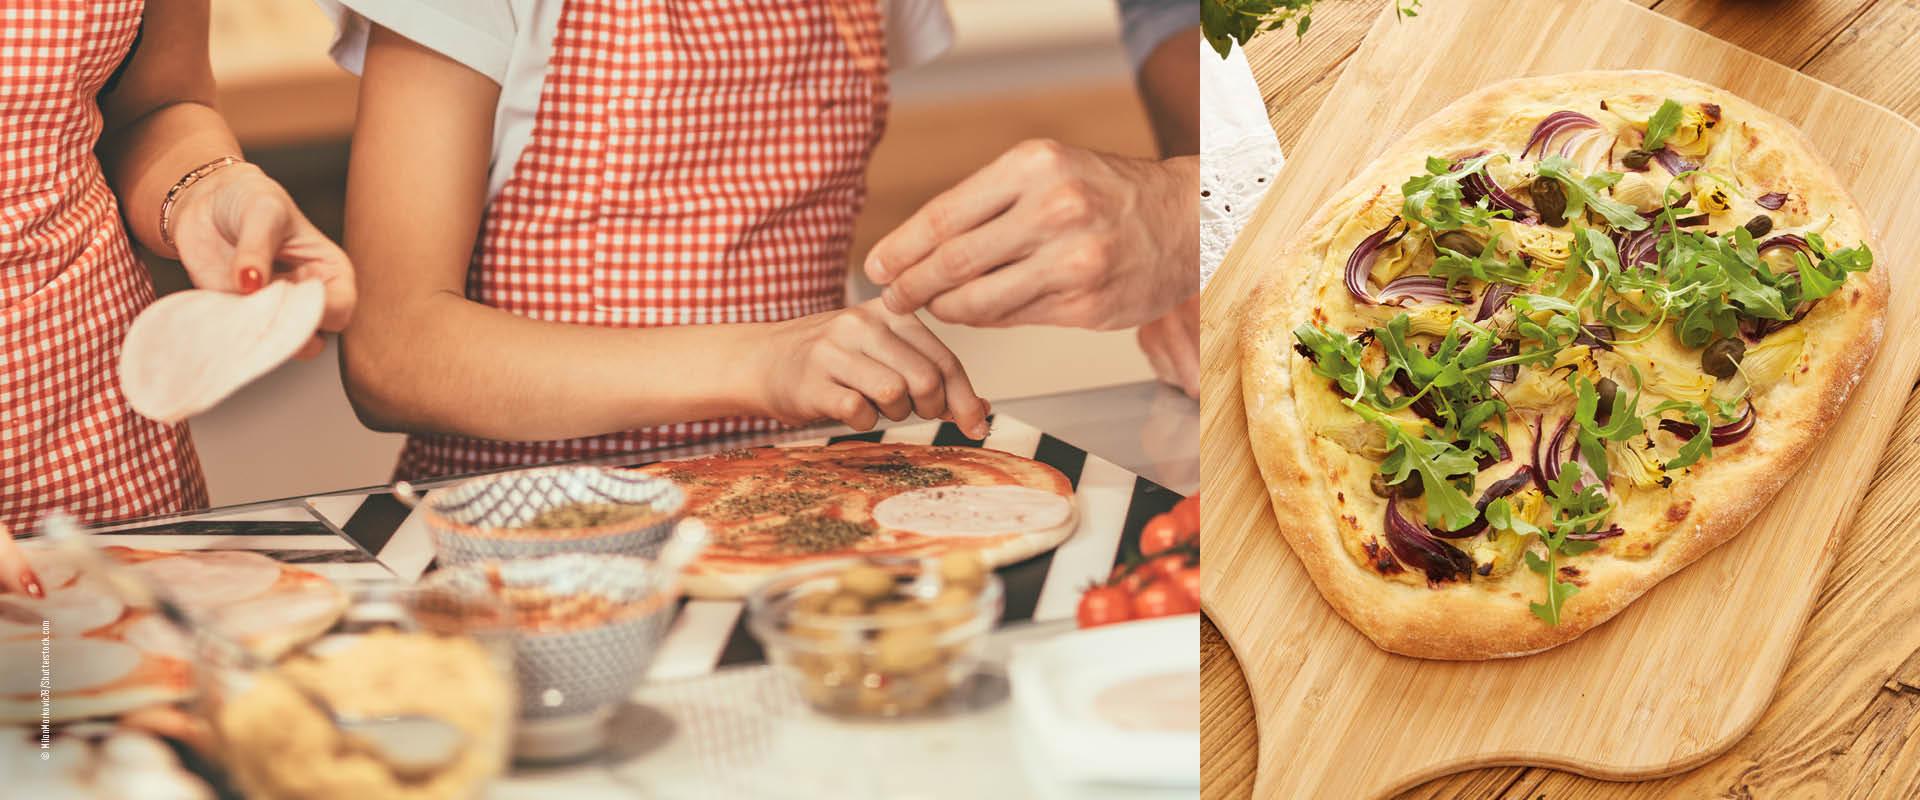 Familie belegt Pizzateig